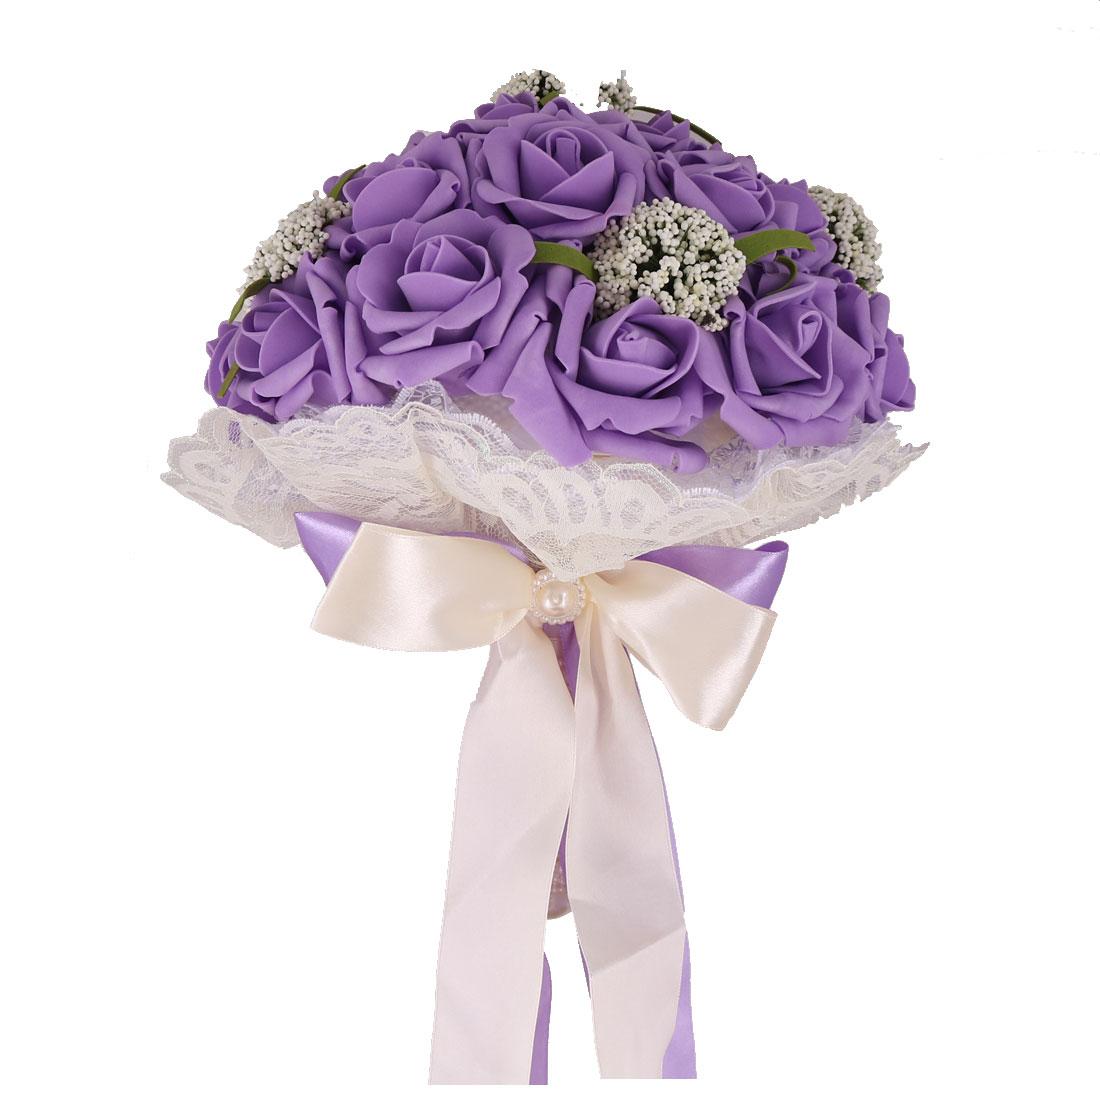 Wedding Bridesmaid Foam Bowknot Decoration Flower Handhold Bouquet Purple 9 Inch Dia